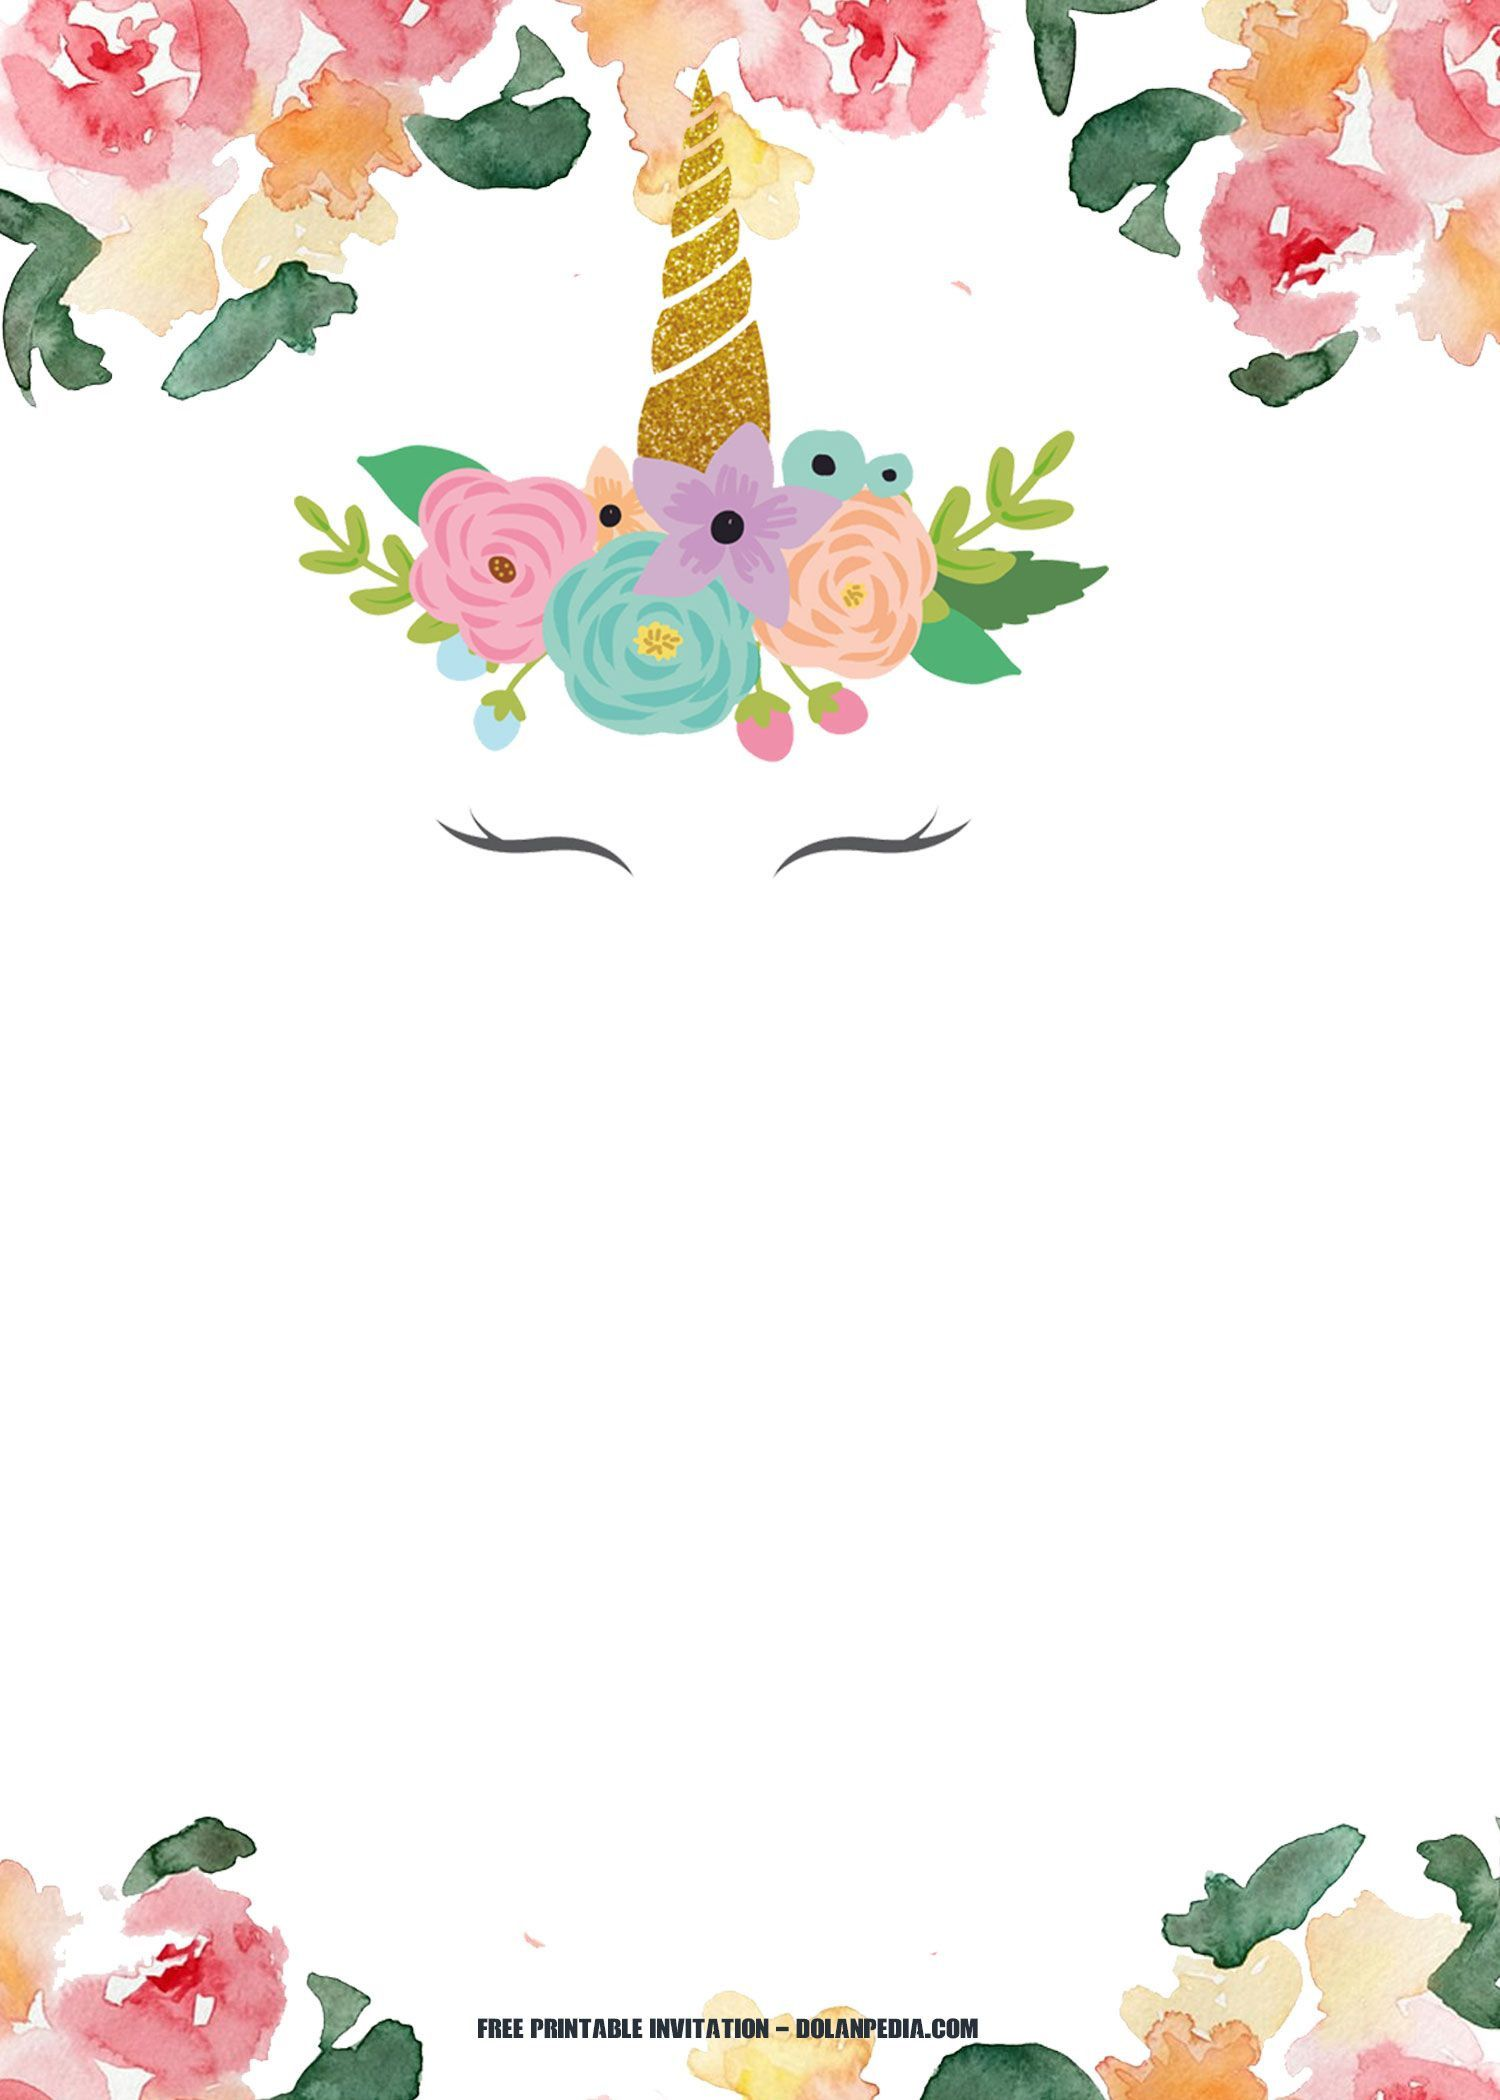 008 Wondrou Unicorn Baby Shower Template Free Download Sample  Printable InvitationFull